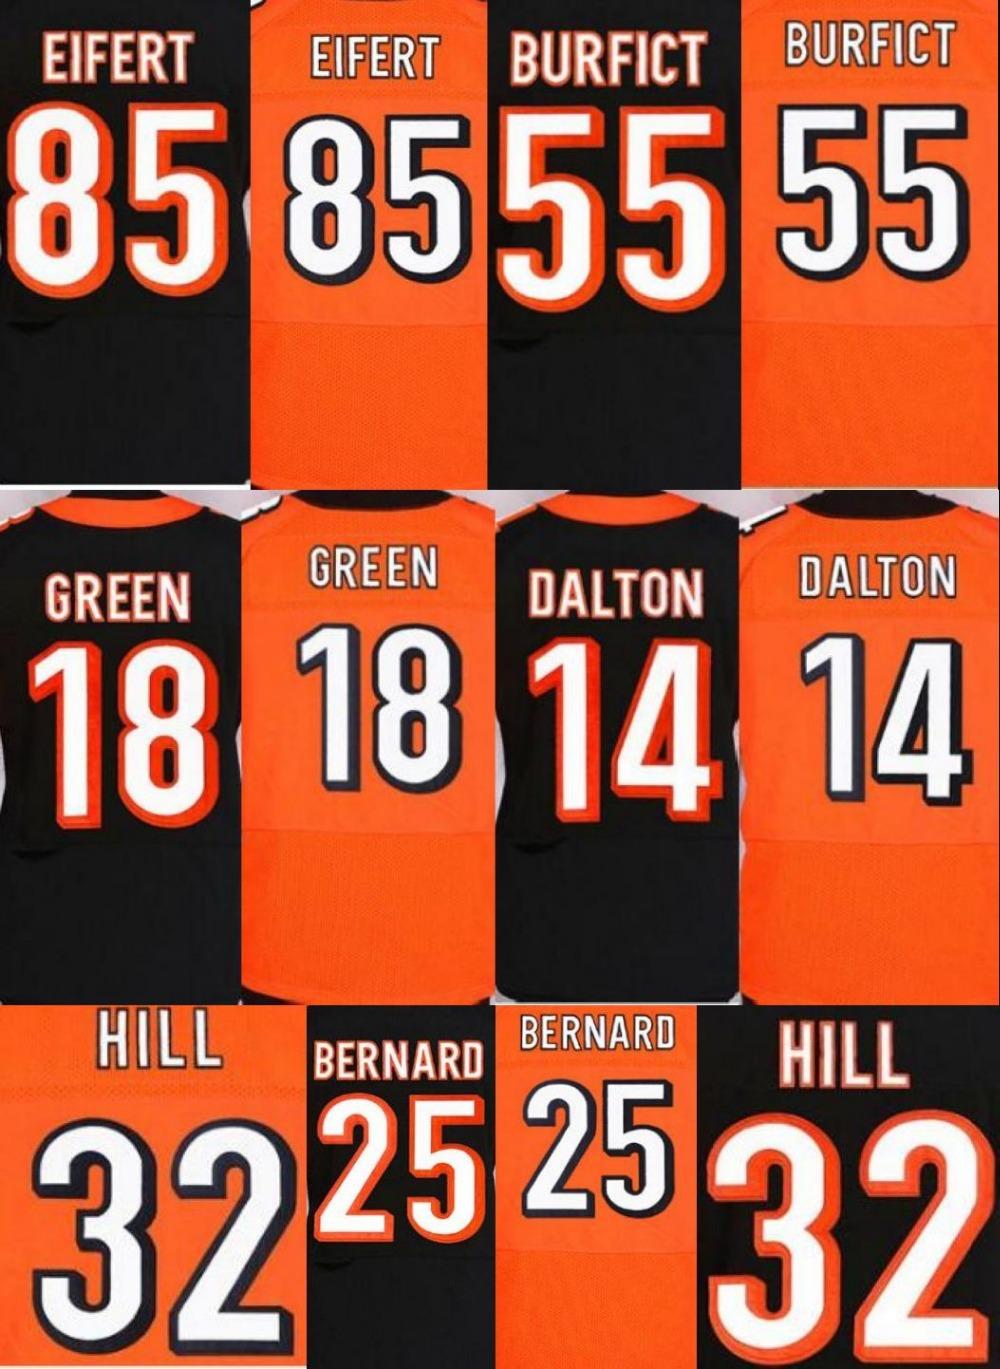 NEW arival #14 Andy Dalton jersey 18 A.J. AJ Green 55 Vontaze Burfict 25 Giovani Bernard 32 Jeremy Hill 85 Tyler Eifert jersey(China (Mainland))